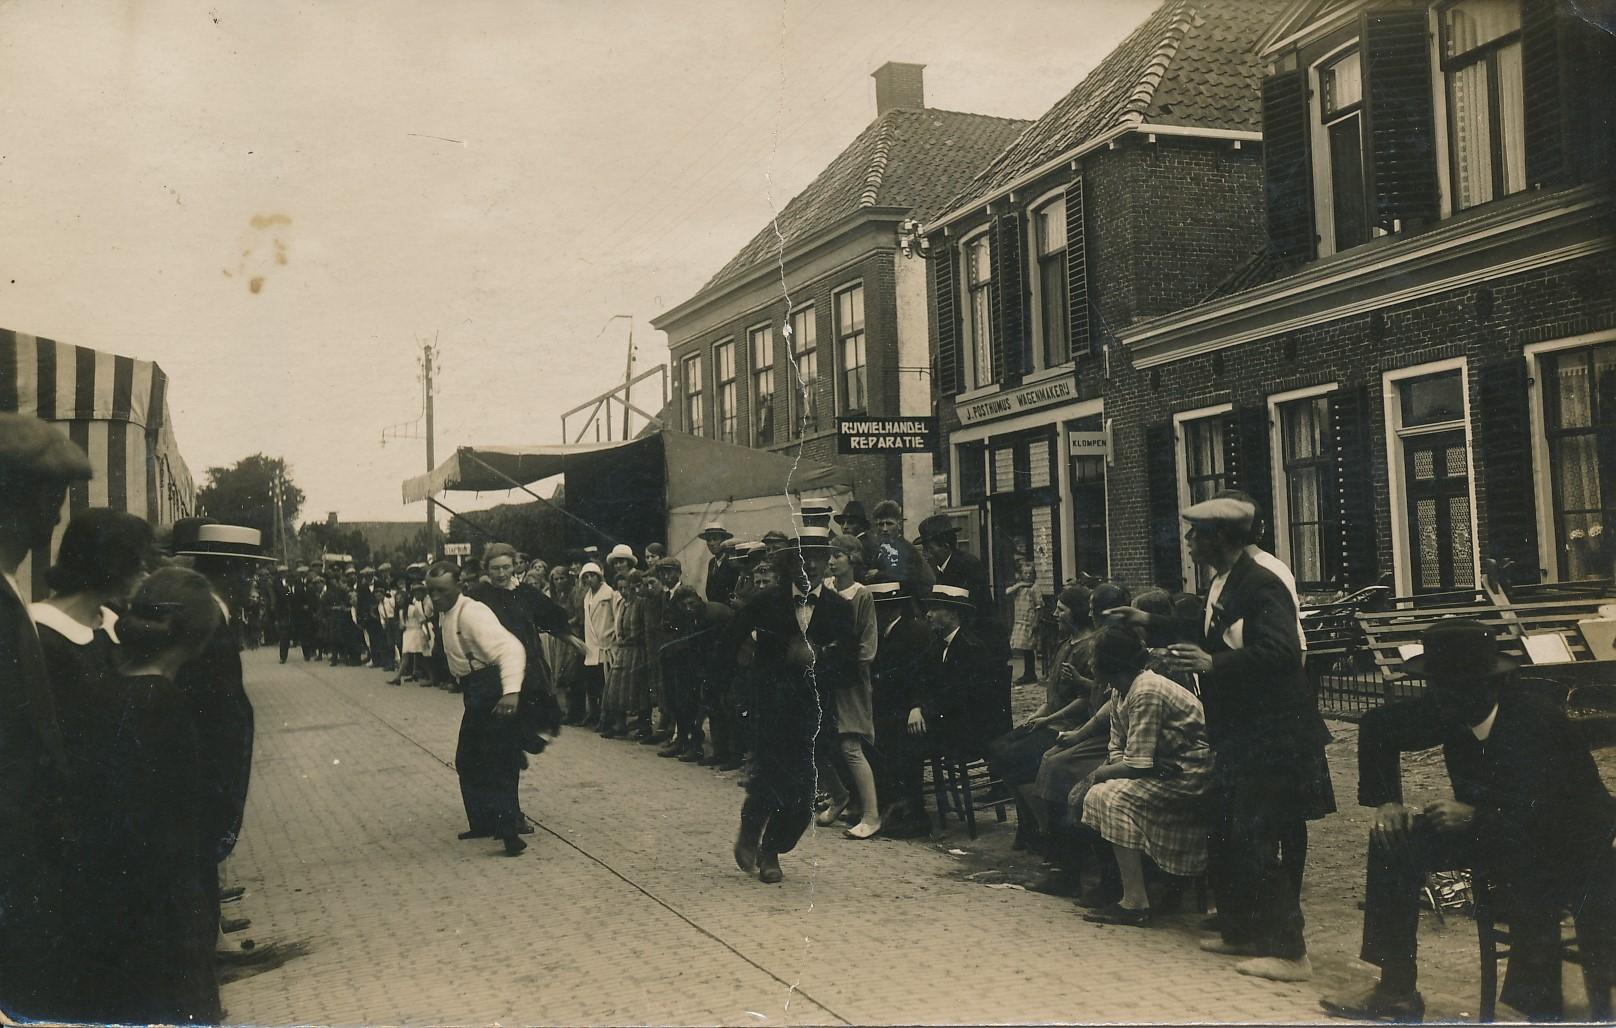 Fotoalbum Andre Kamsma, 001, foarkant, merke 1928